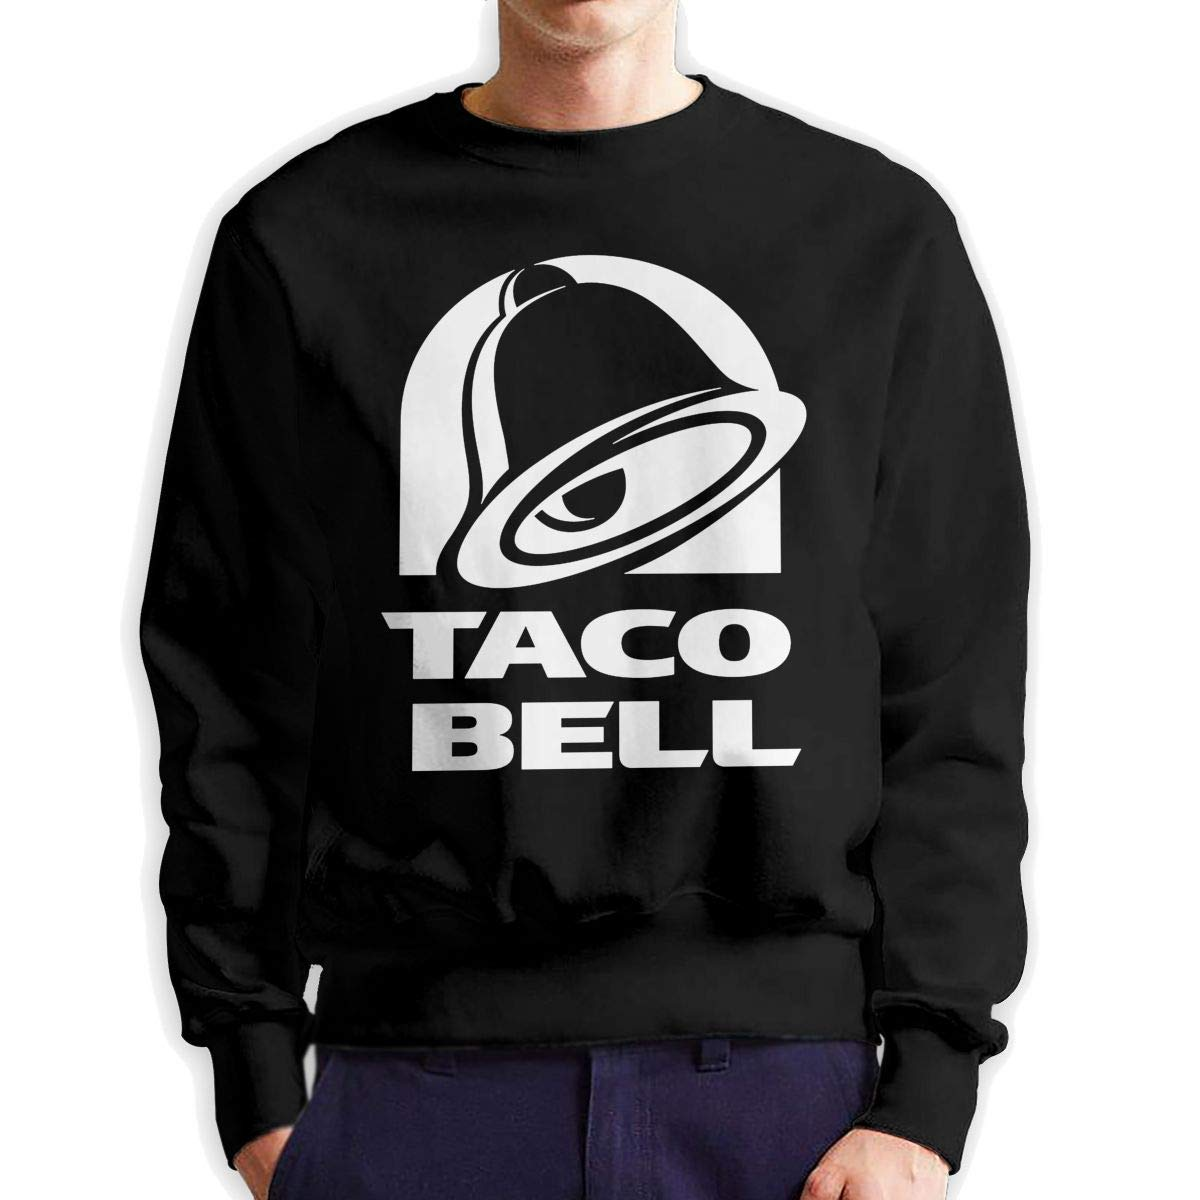 Kaddias Mens Art Bell with Taco Comfortable Crew Neck Fleeces Sweatshirt Black